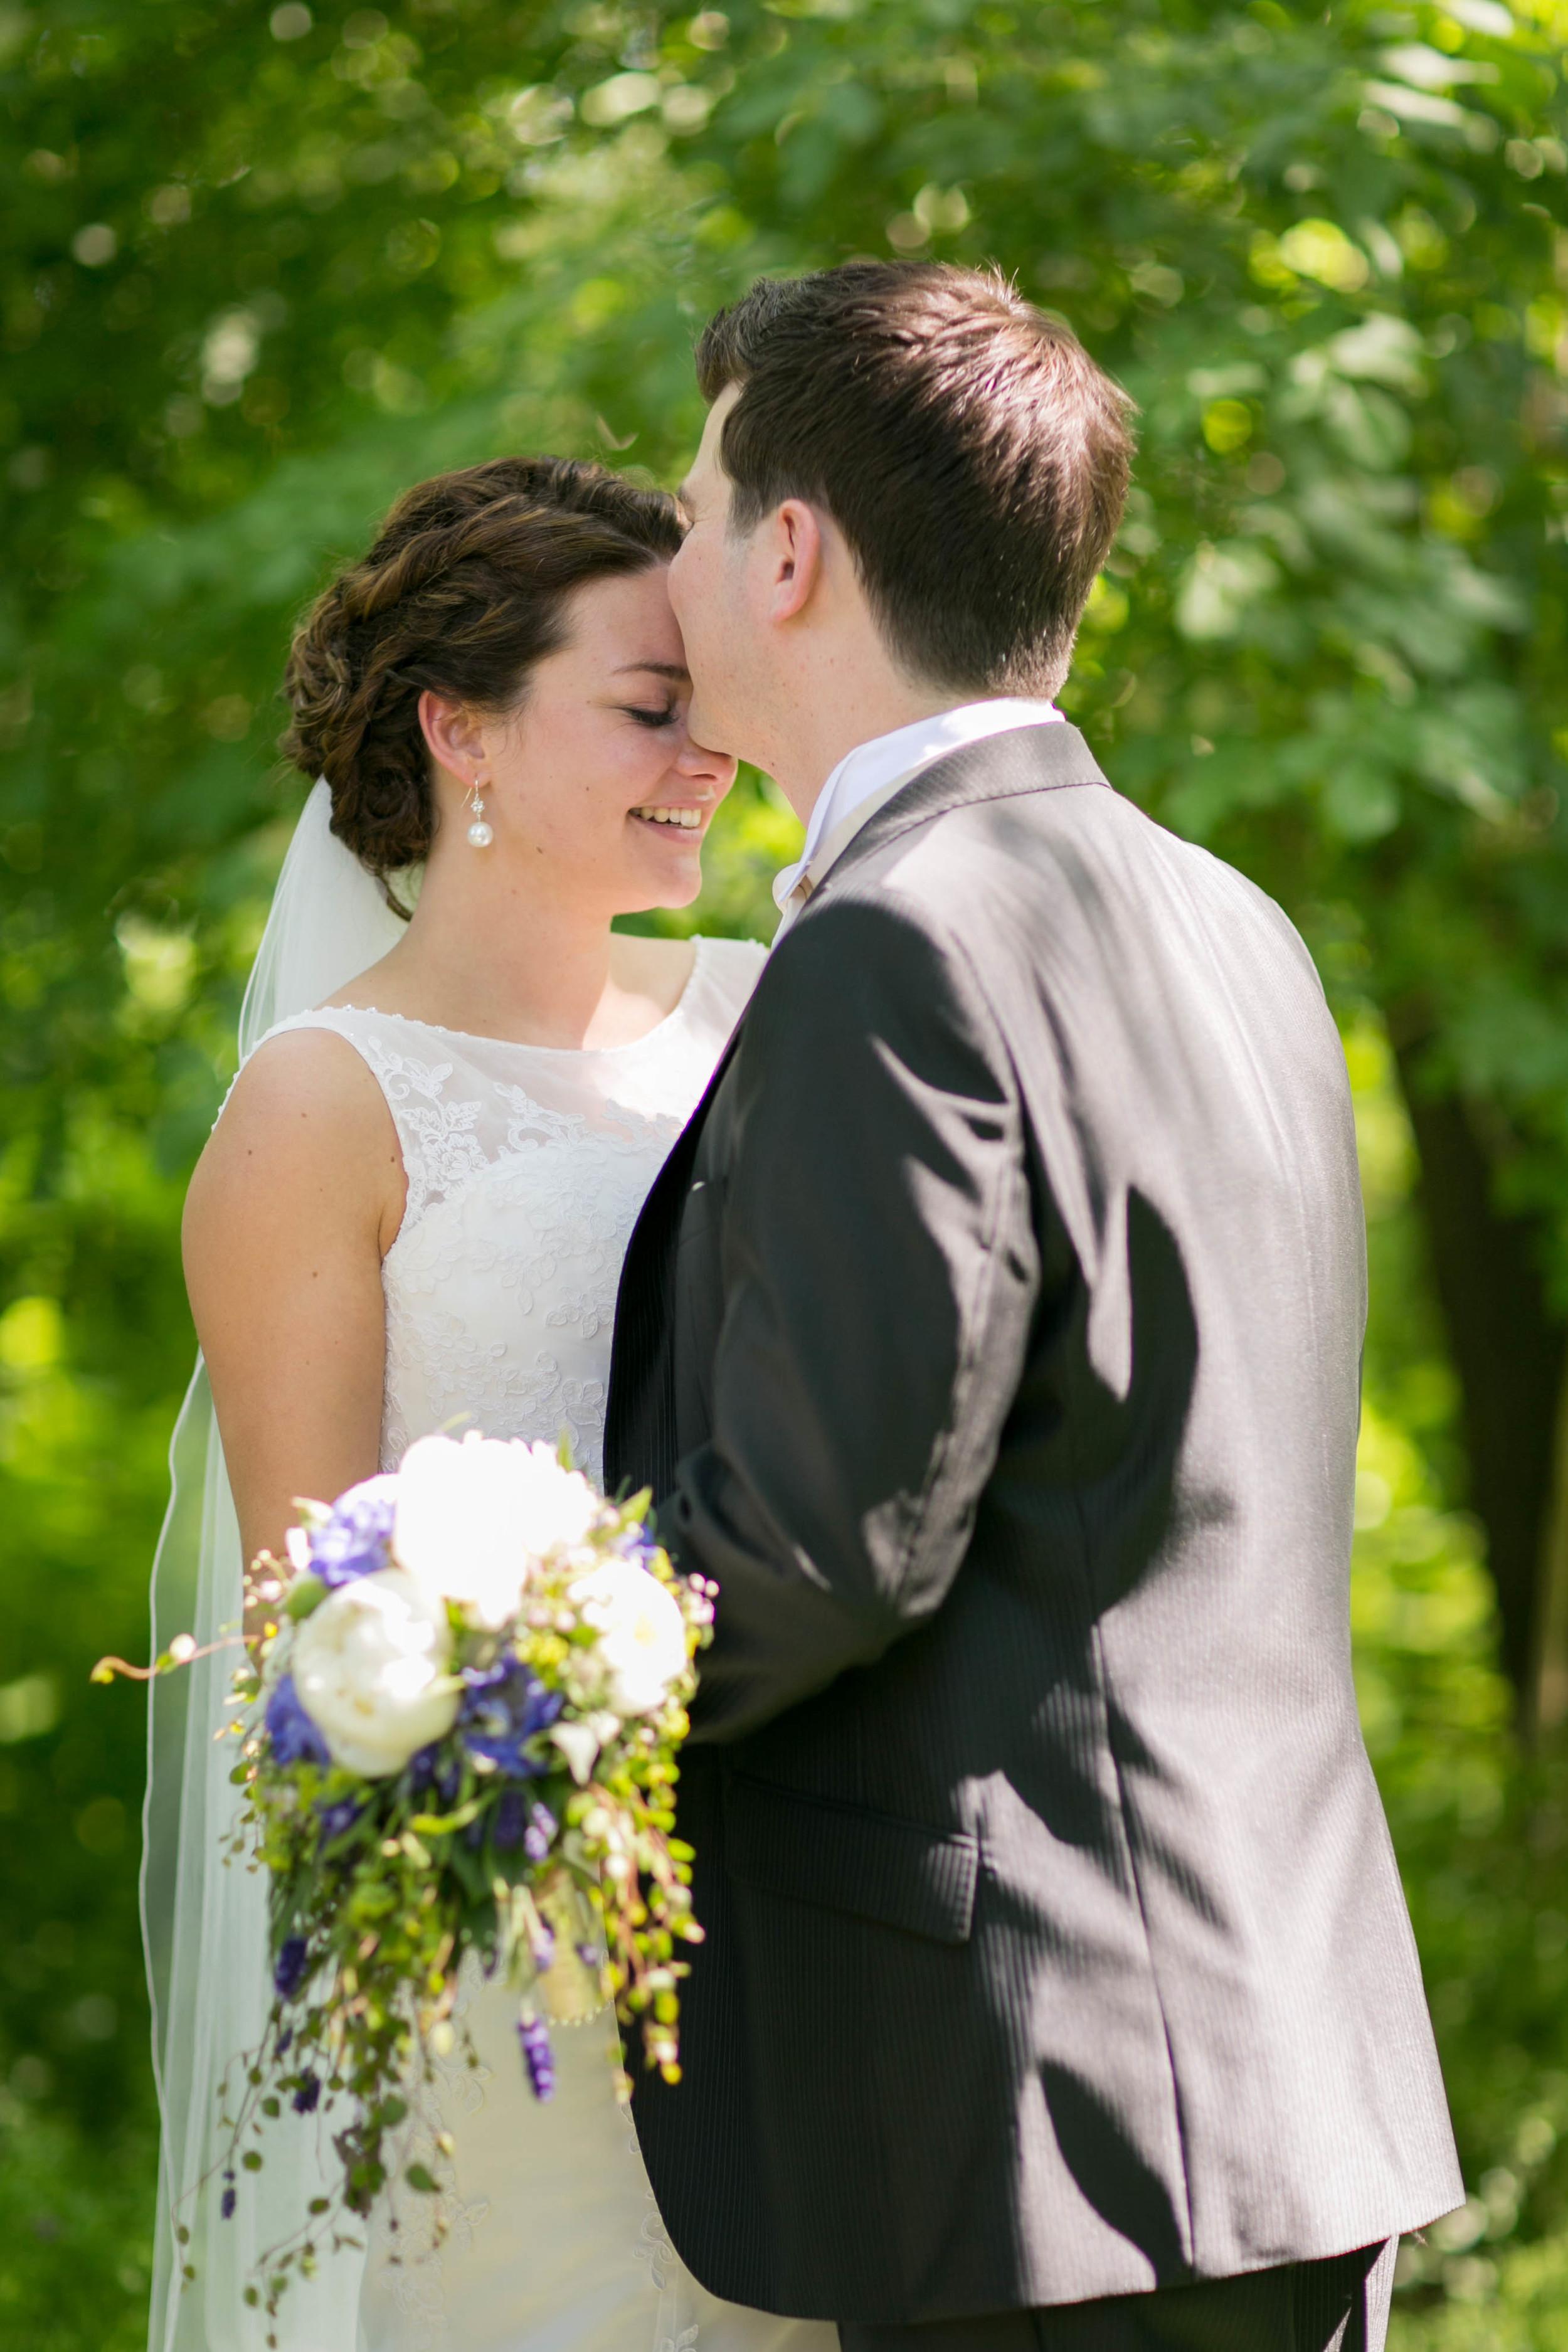 Hochzeitsfotografie Berlin_Fran Burrows Fotografie-194.jpg